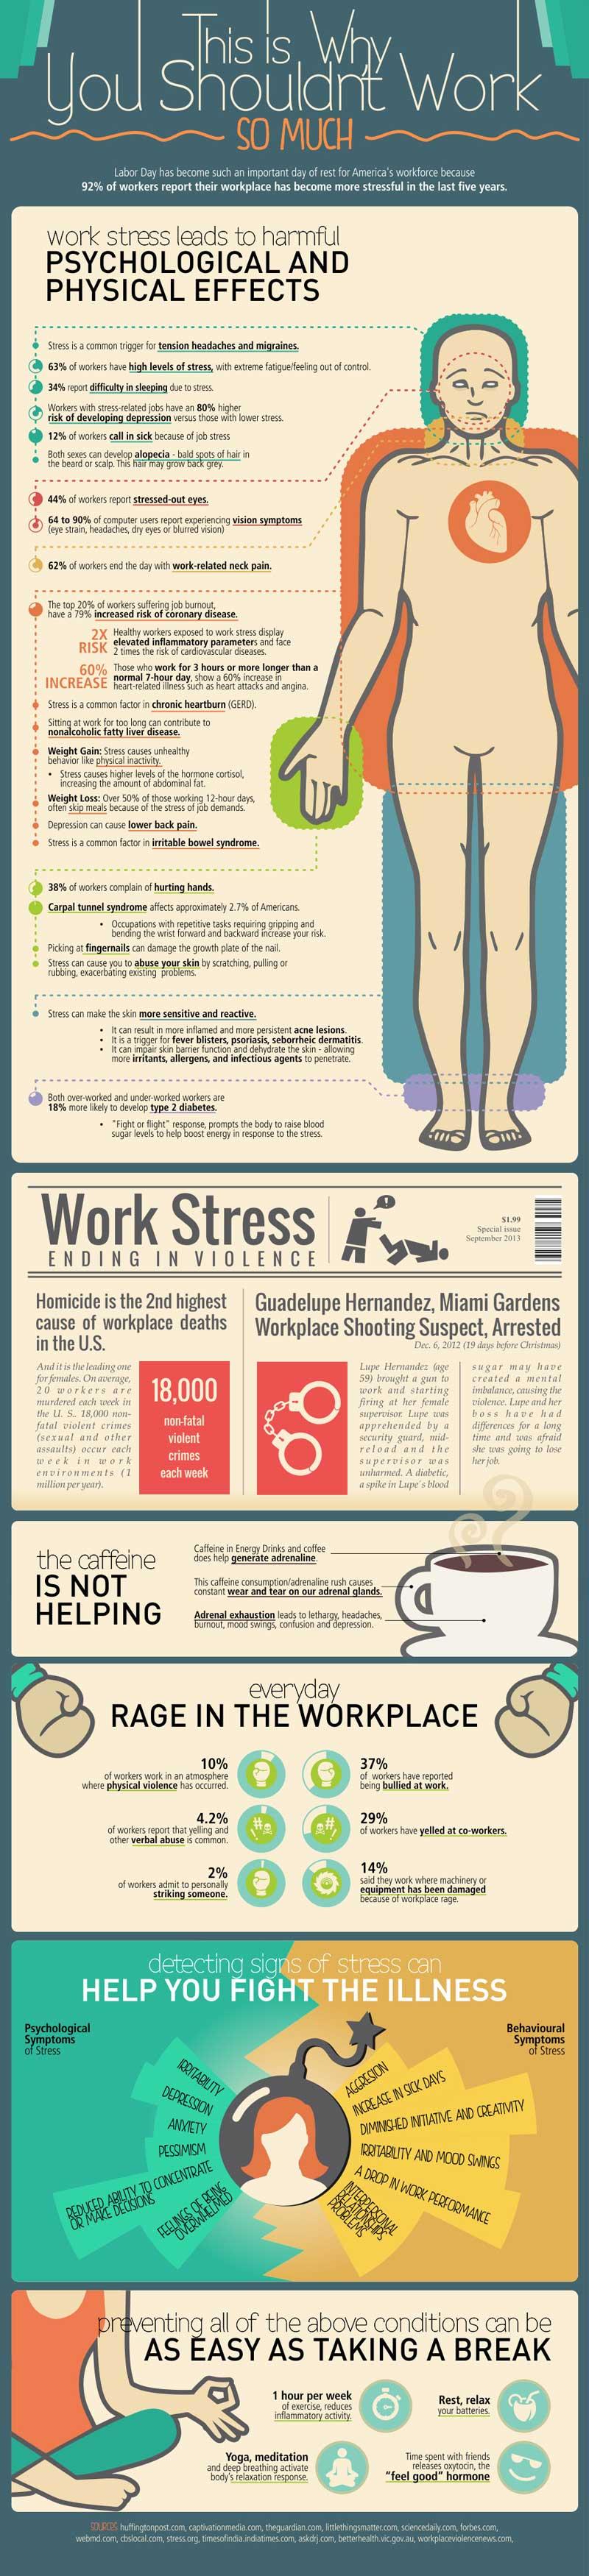 stress-drives-crazy